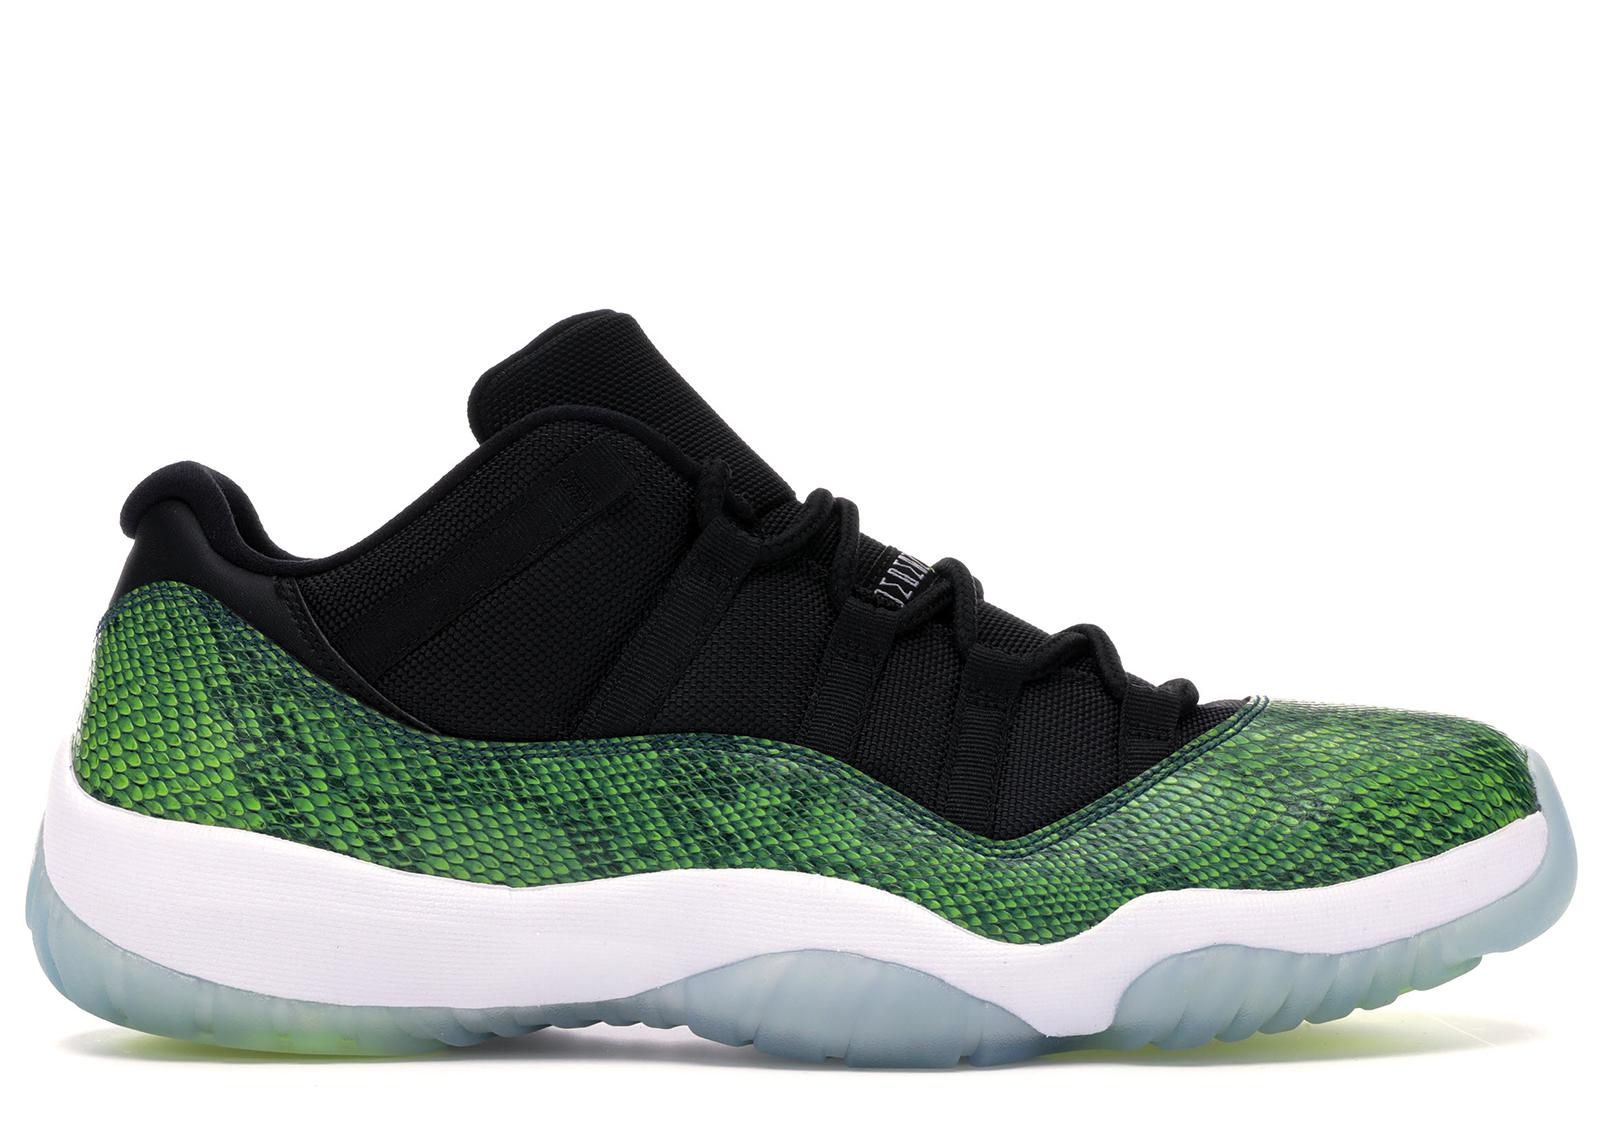 Jordan 11 Retro Low Green Snakeskin